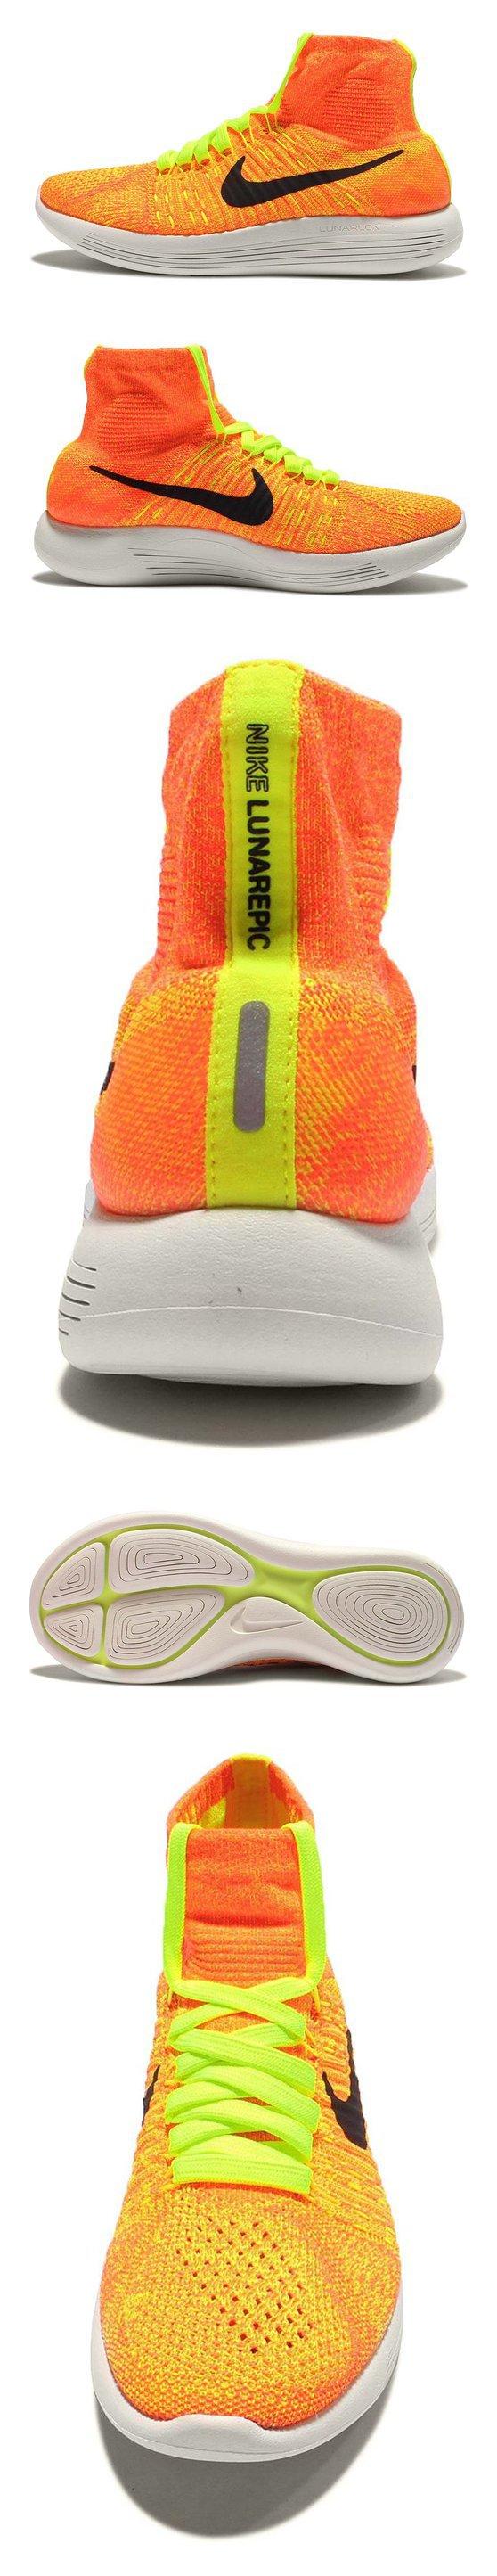 a35d0347f00a  220 - Nike Women s Wmns Lunarepic Flyknit HYPER ORANGE BLACK-VOLT-SAIL   shoes  nike